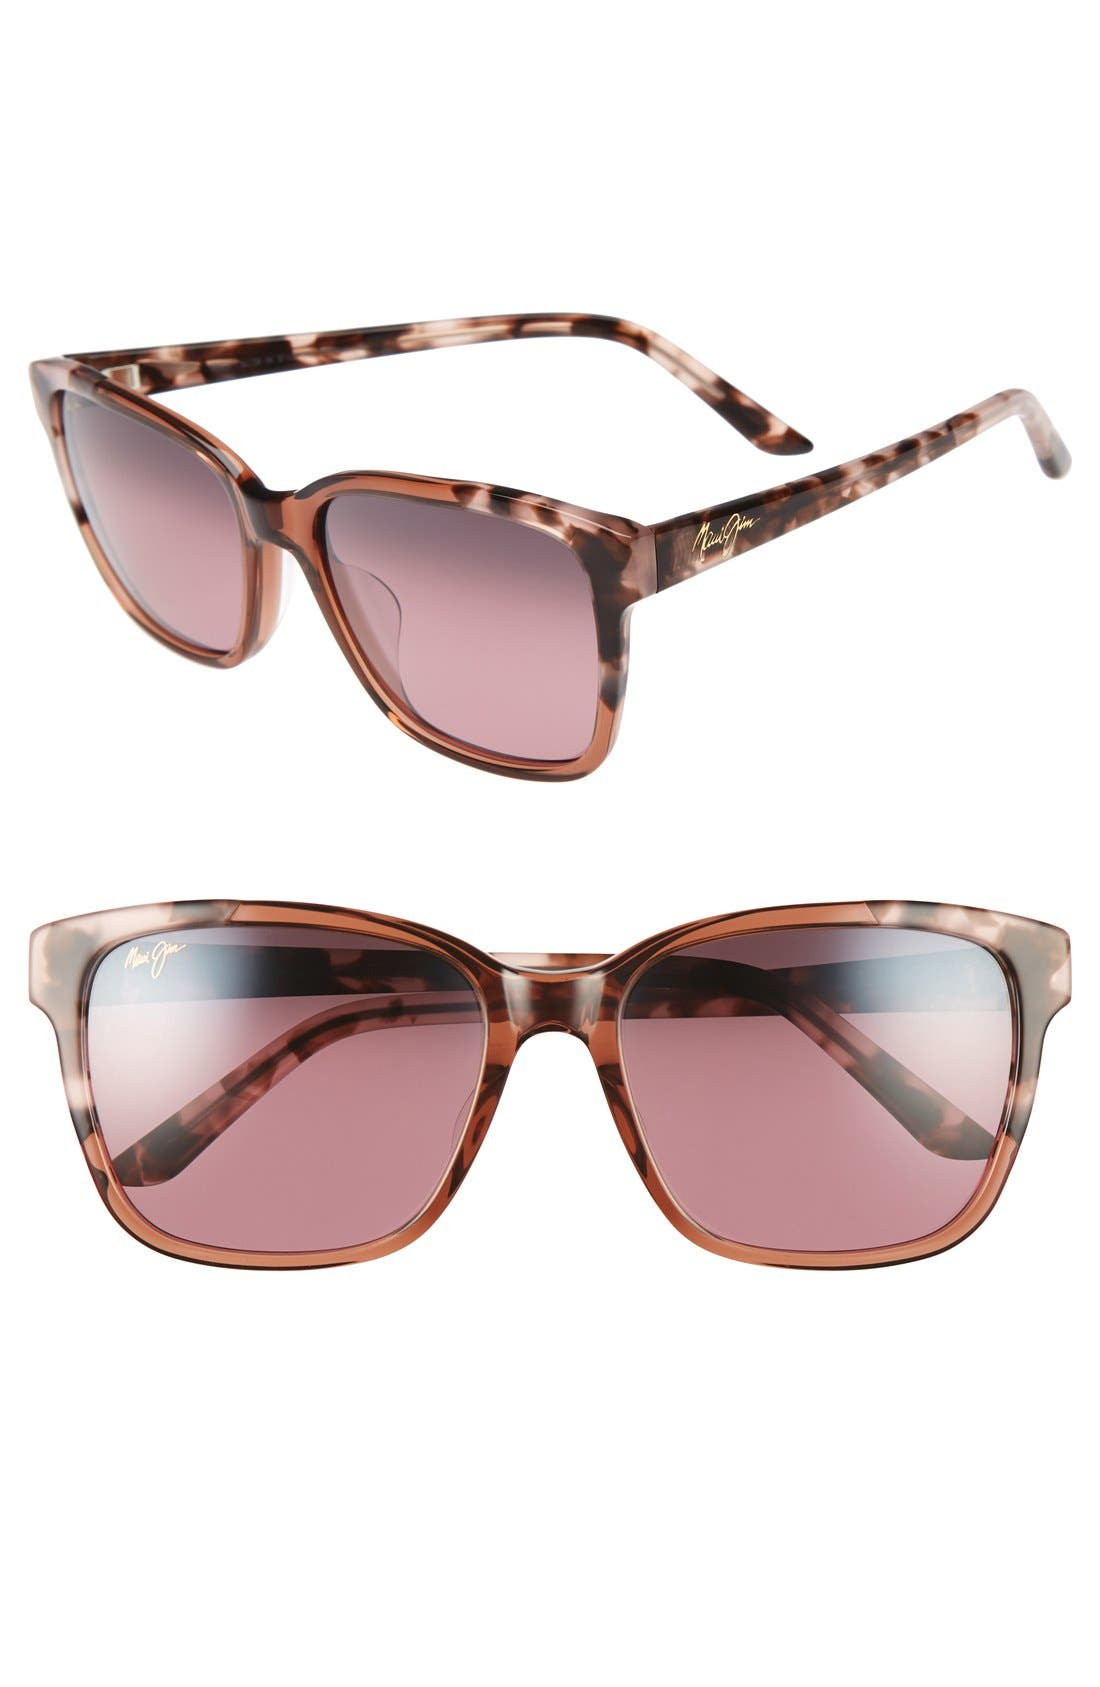 Main Image - Maui Jim Moonbow 57mm PolarizedPlus2® Sunglasses